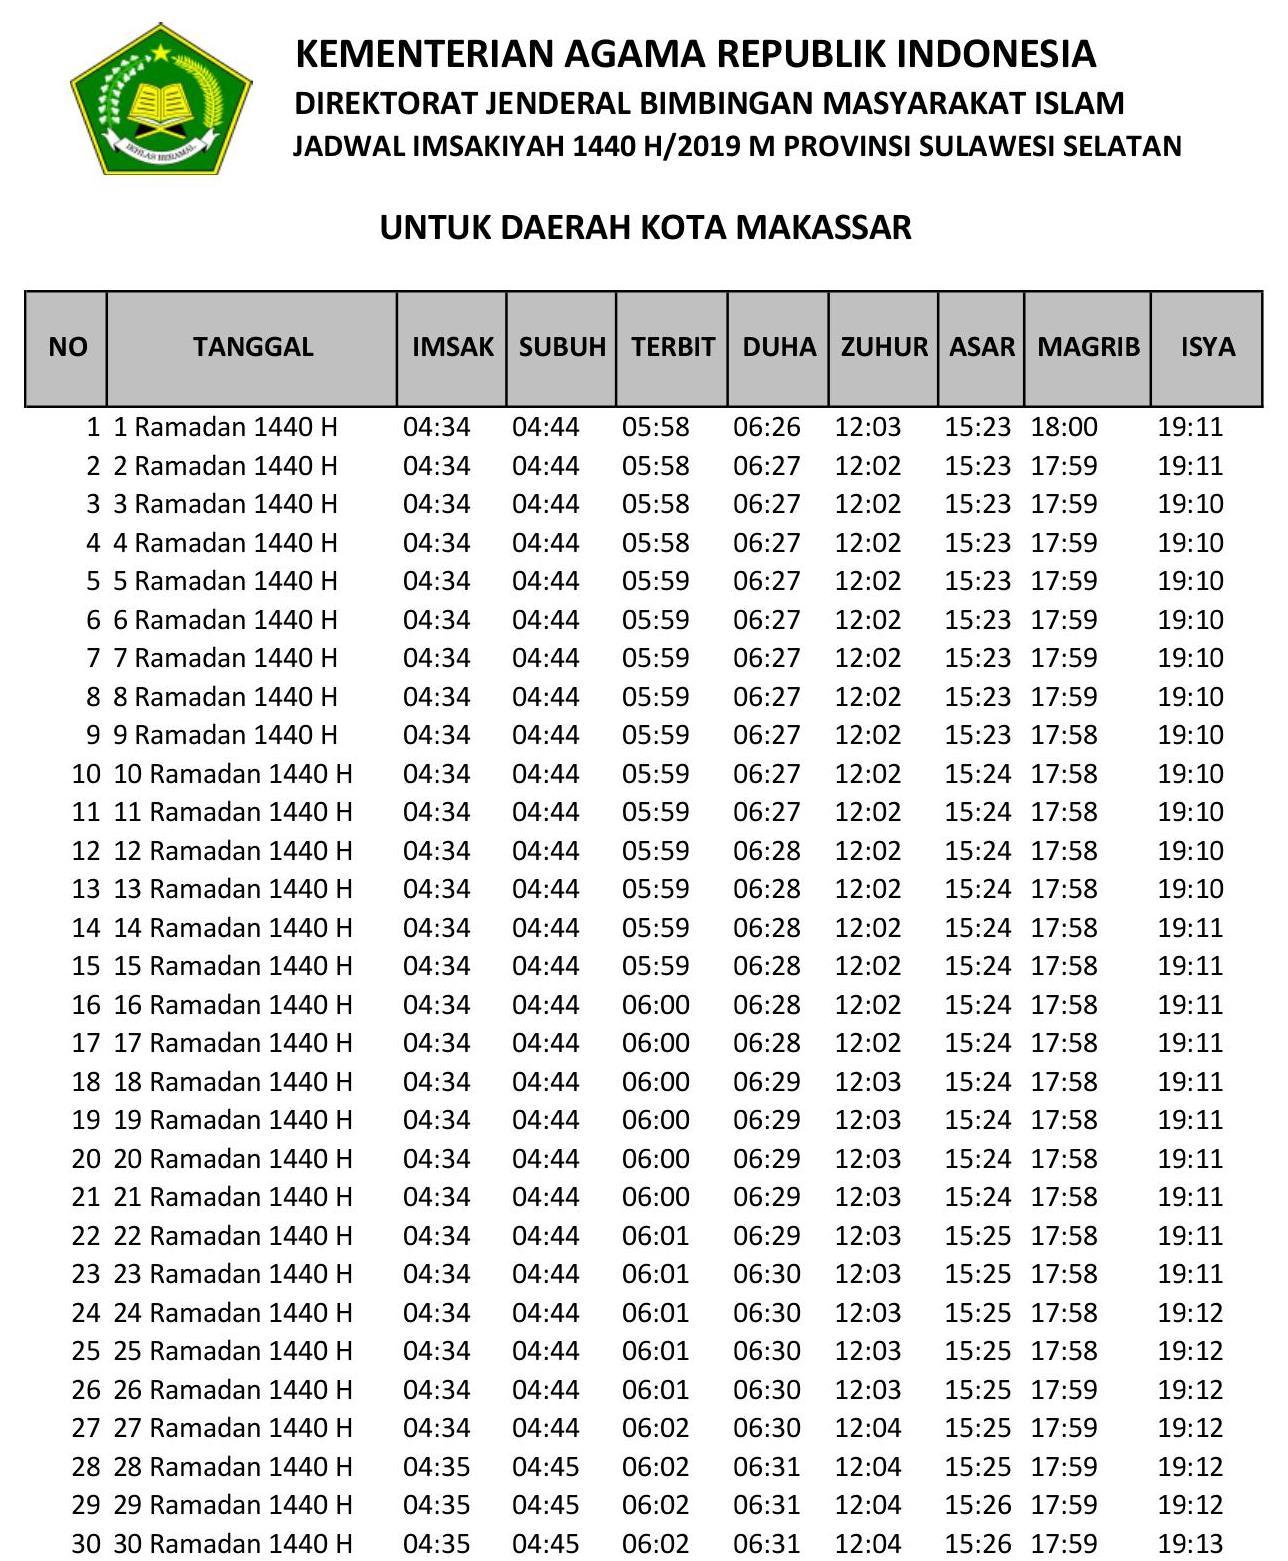 Jadwal Sholat dan Imsakiyah Makasar-Ramadhan 2019-Waktu Maghrib, Waktu Imsak, dan Waktu Shubuh di Wilayah Kota Makasar dan Sekitarnya, Sulawesi Selatan-Bulan Puasa 2019-1440 Hijriyah.